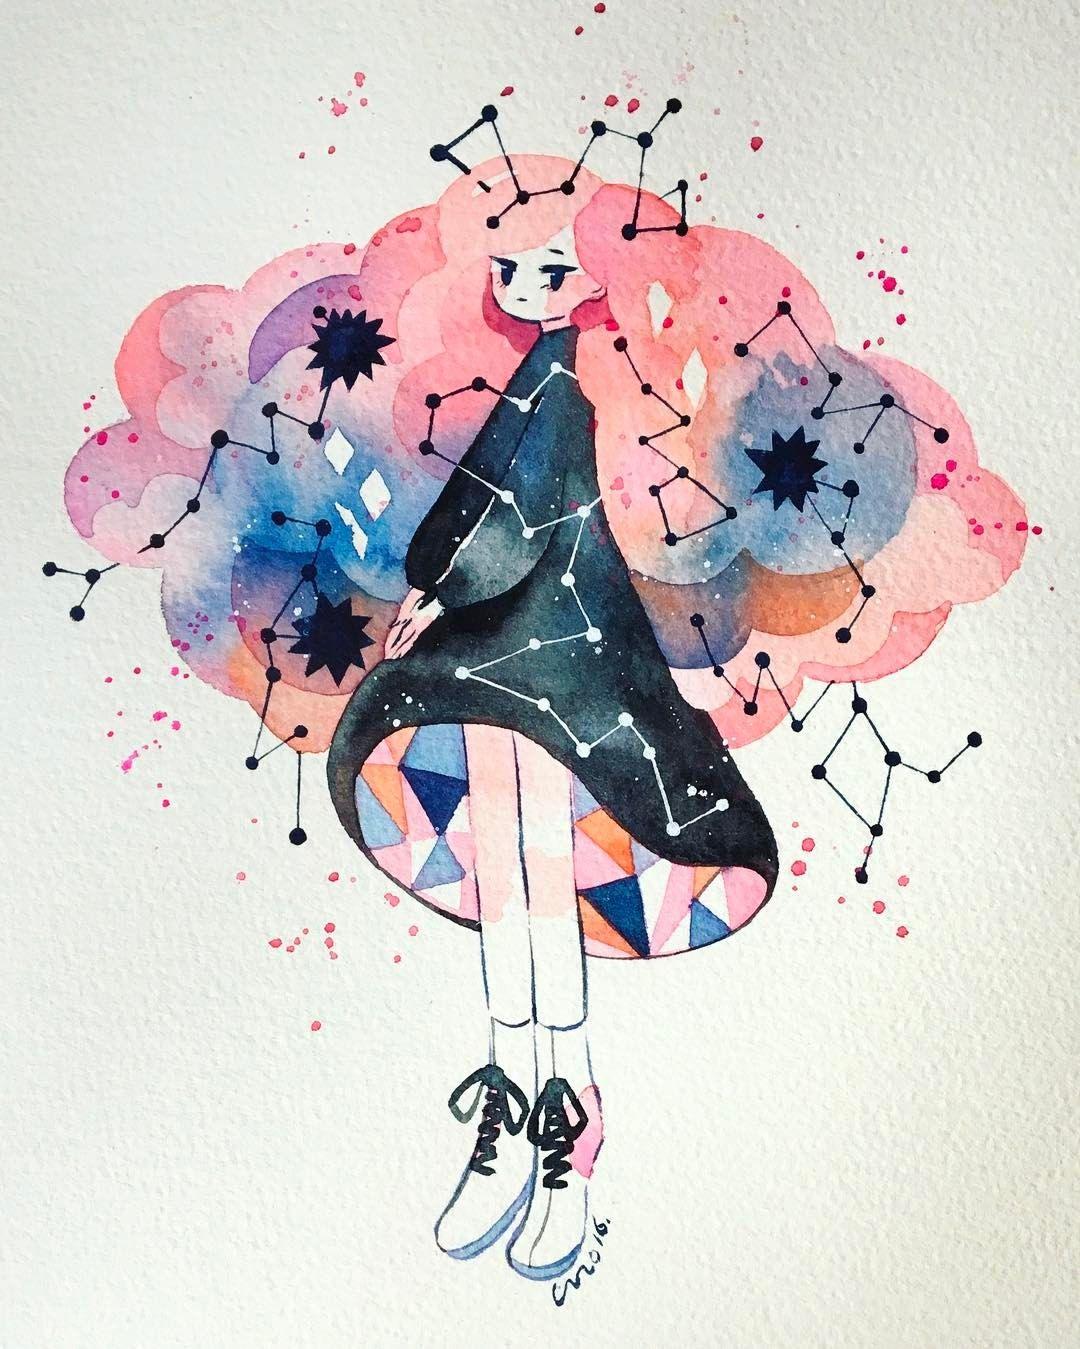 Art Drawings, Colorful Drawings, Drawings